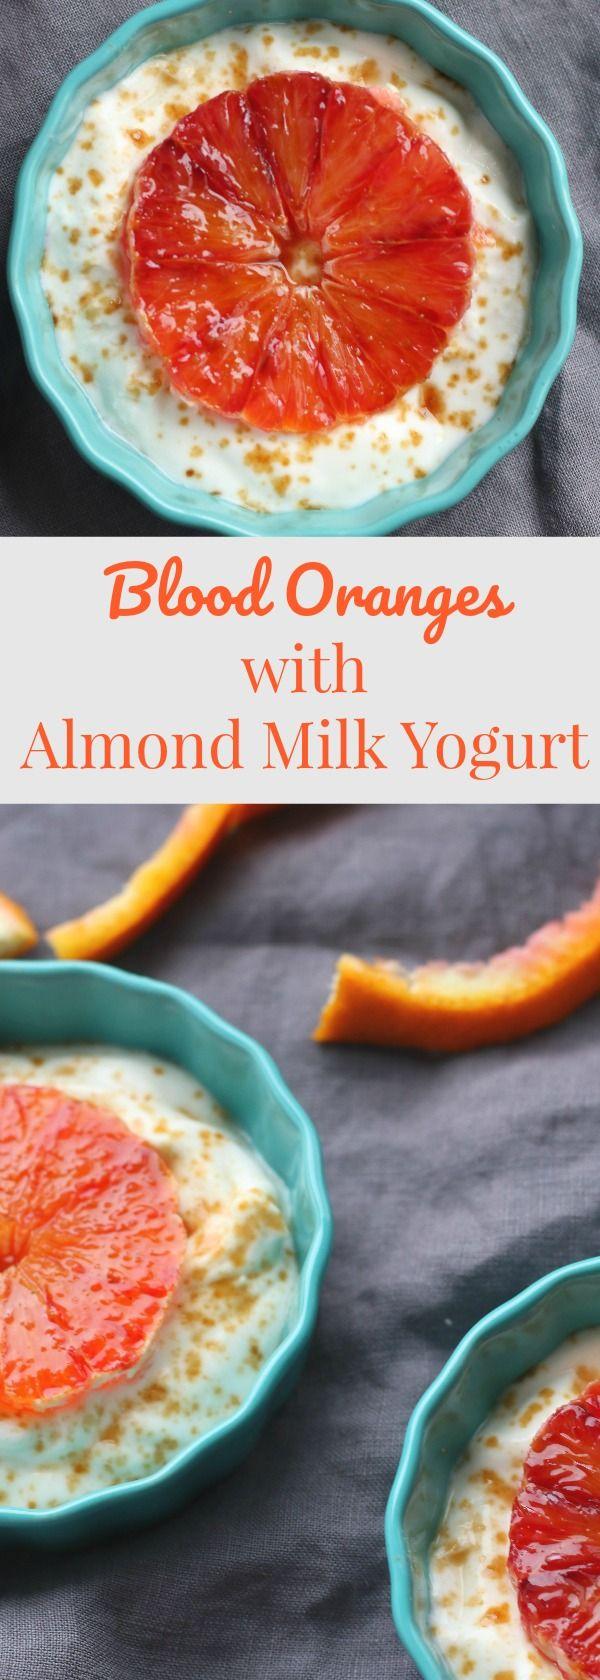 Blood Orange Almond Milk Yogurt.